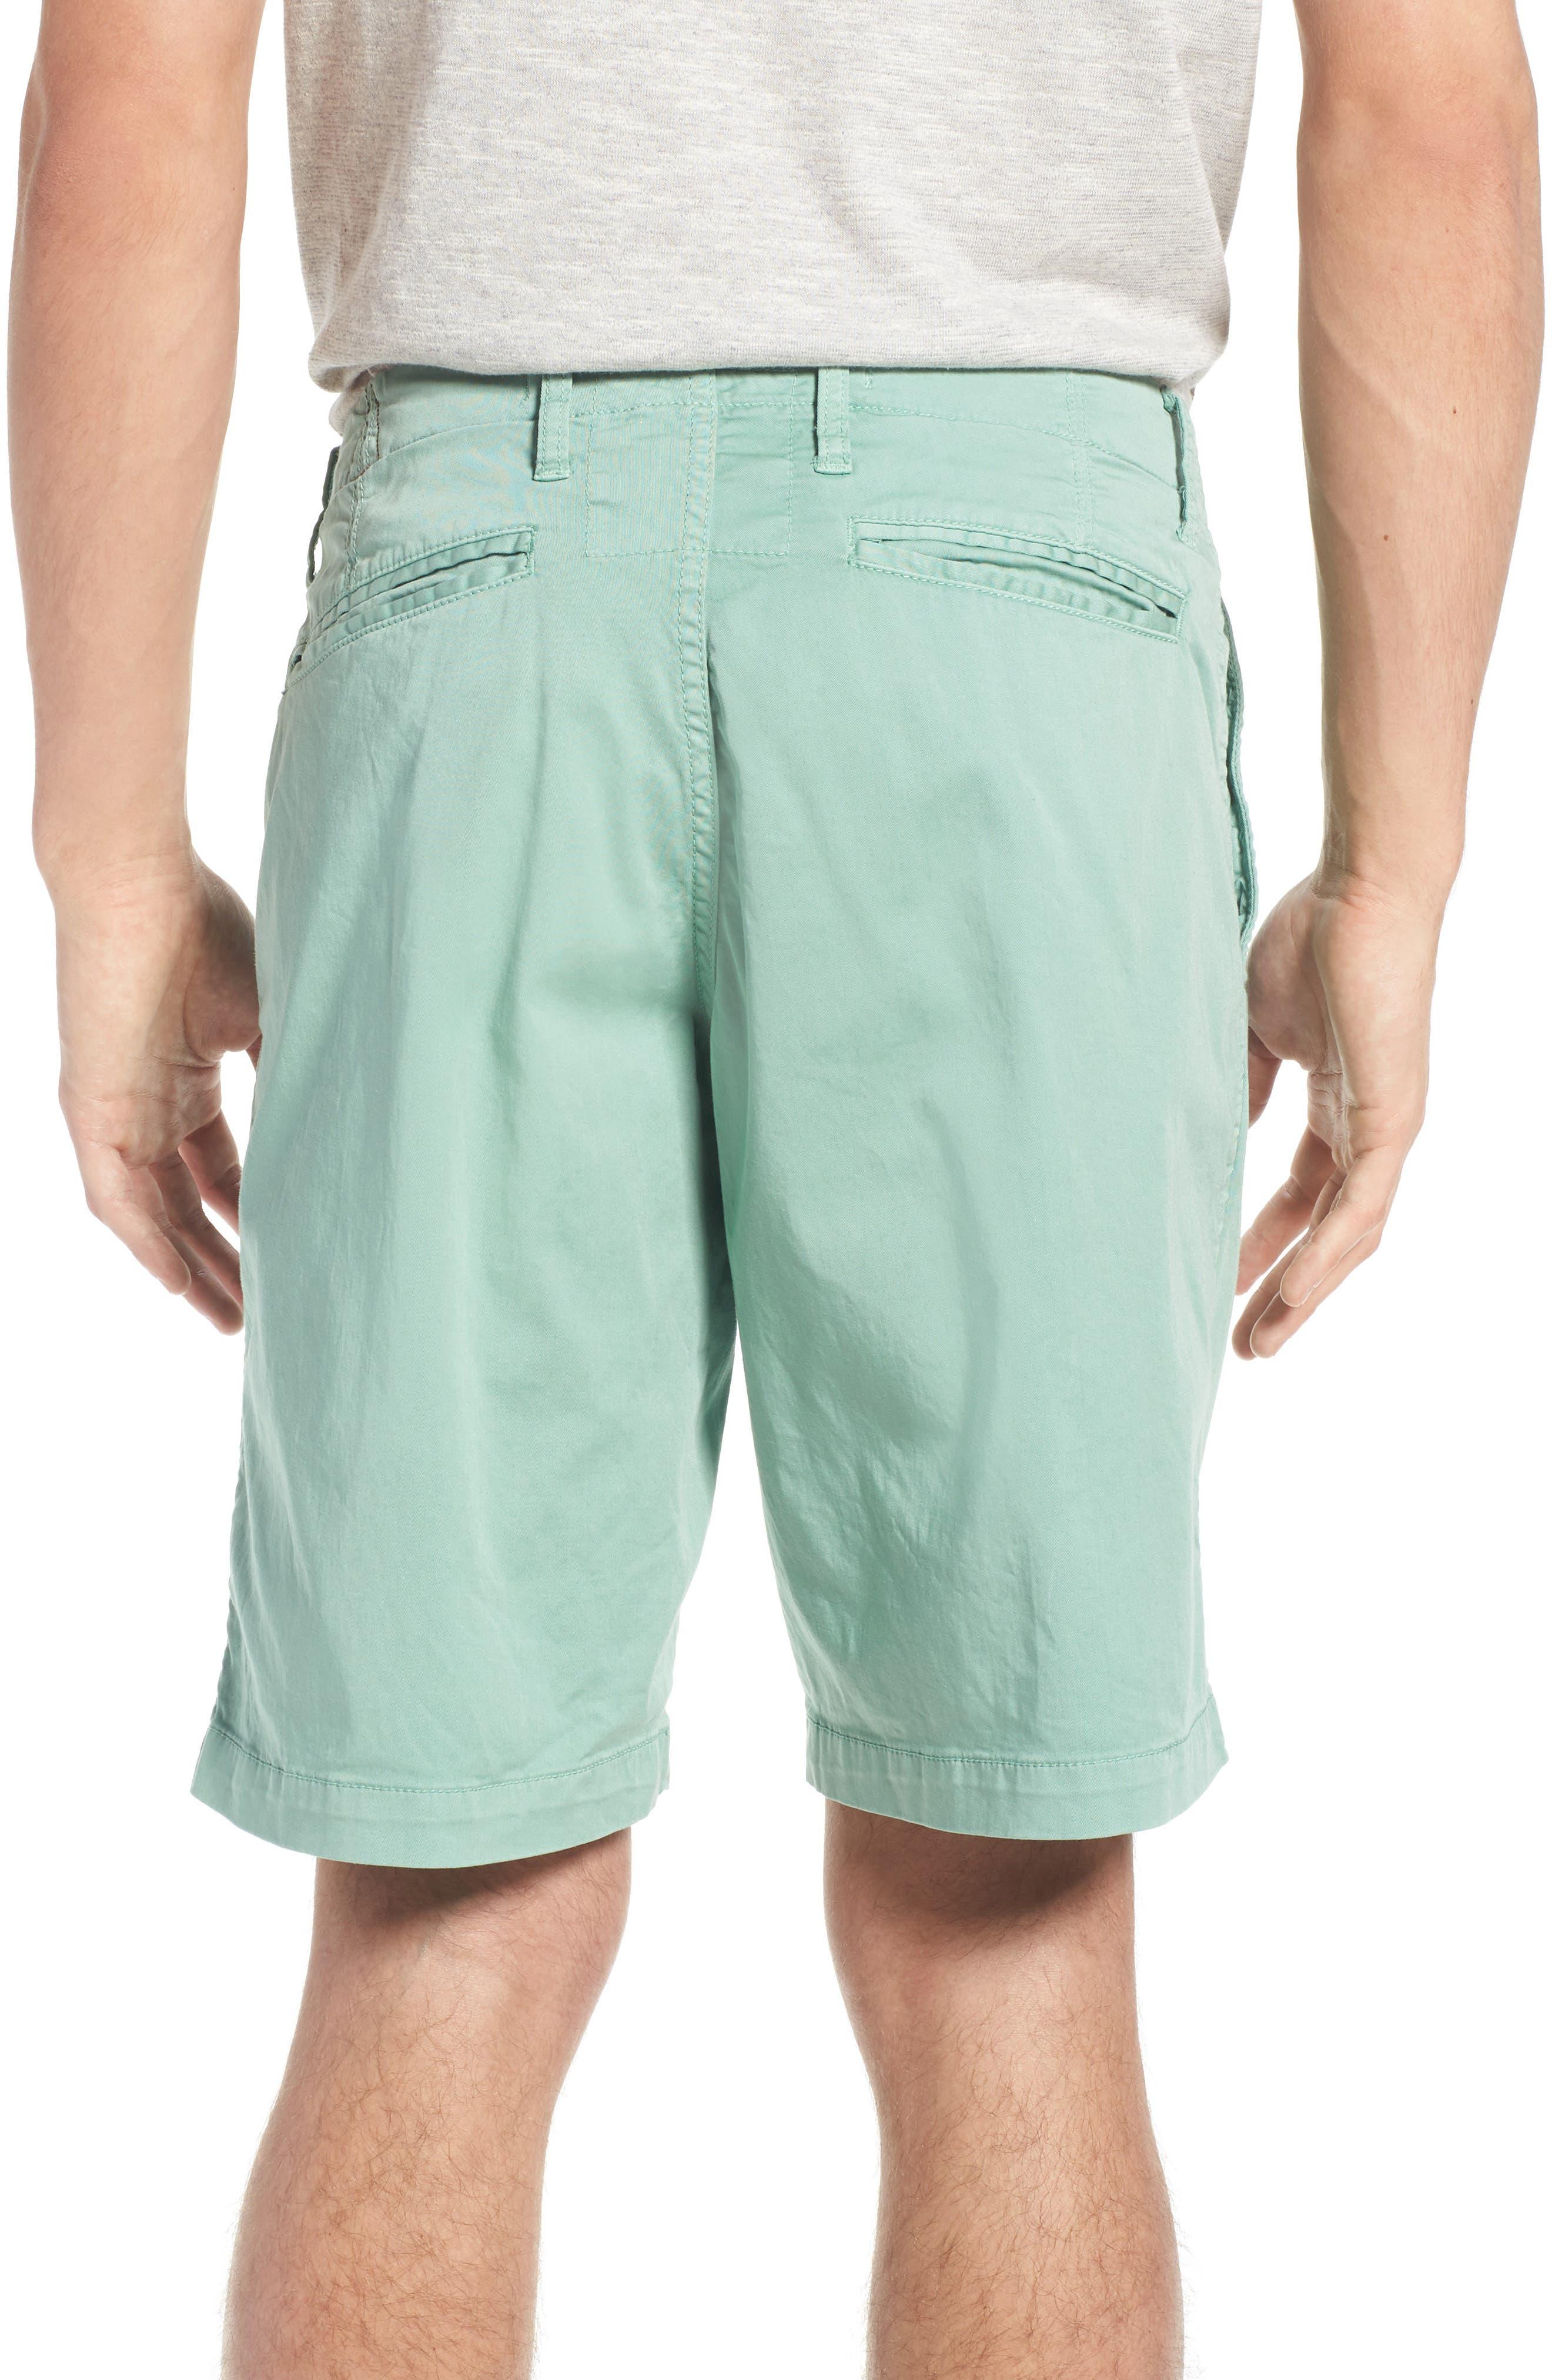 St. Barts Twill Shorts,                             Alternate thumbnail 19, color,